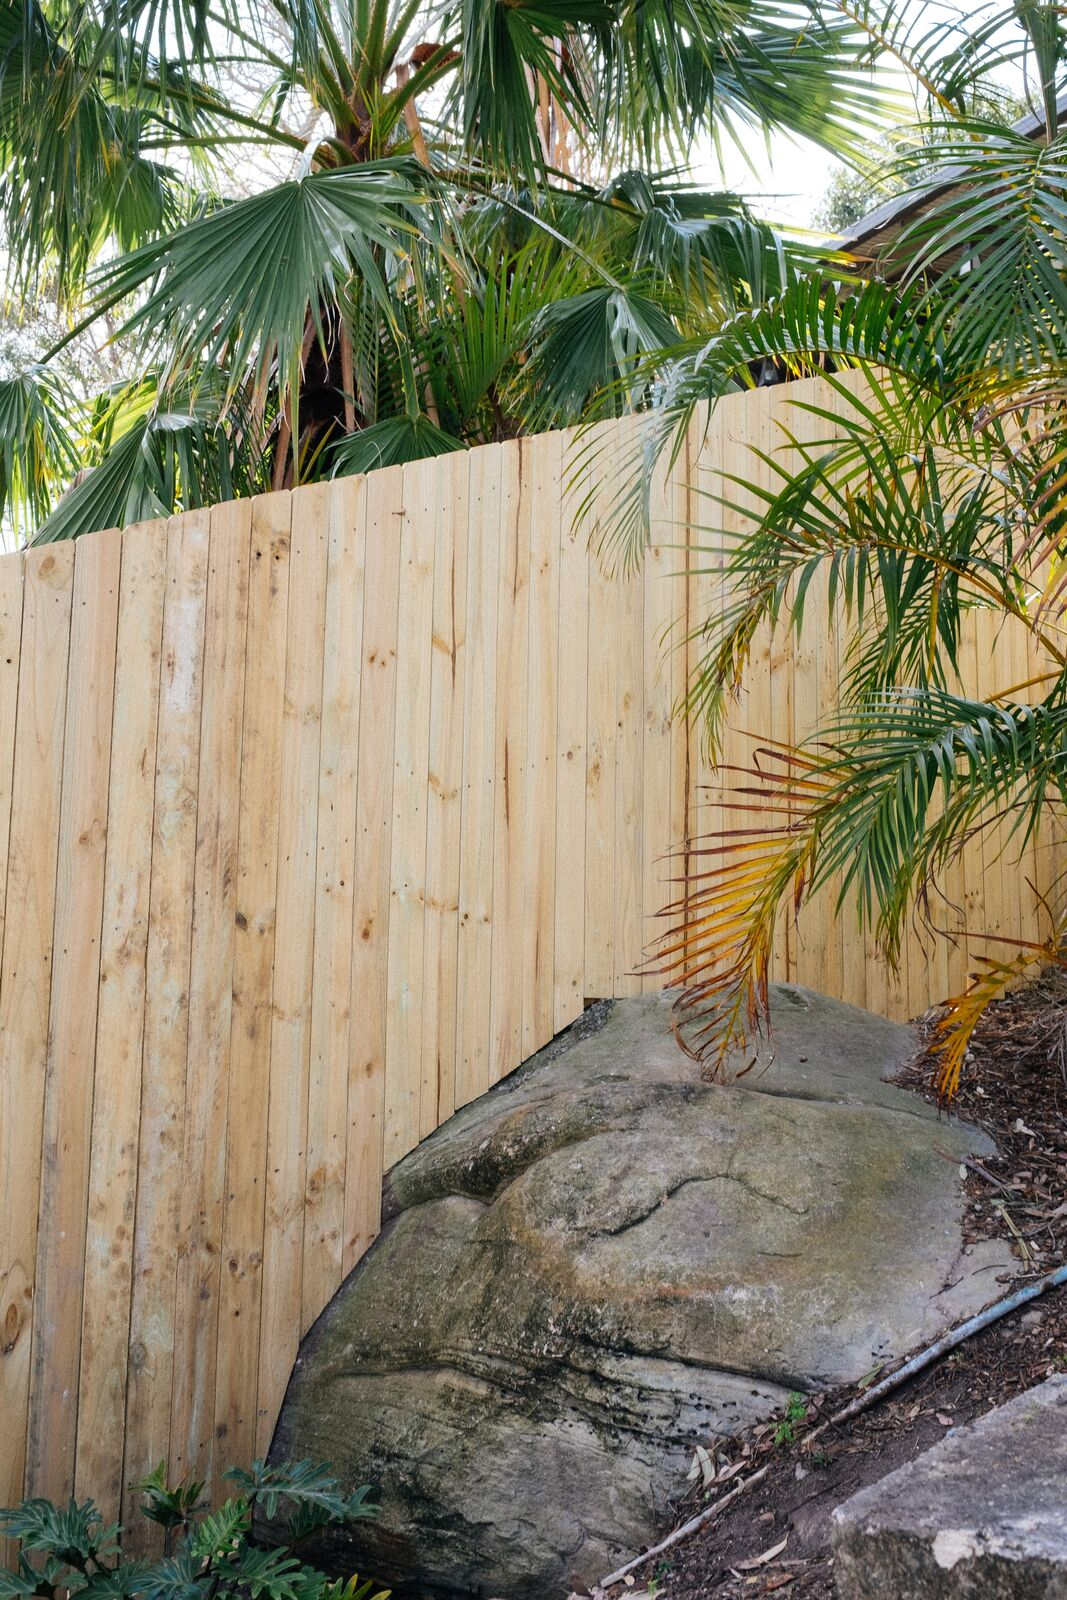 Custom Standard paling fence